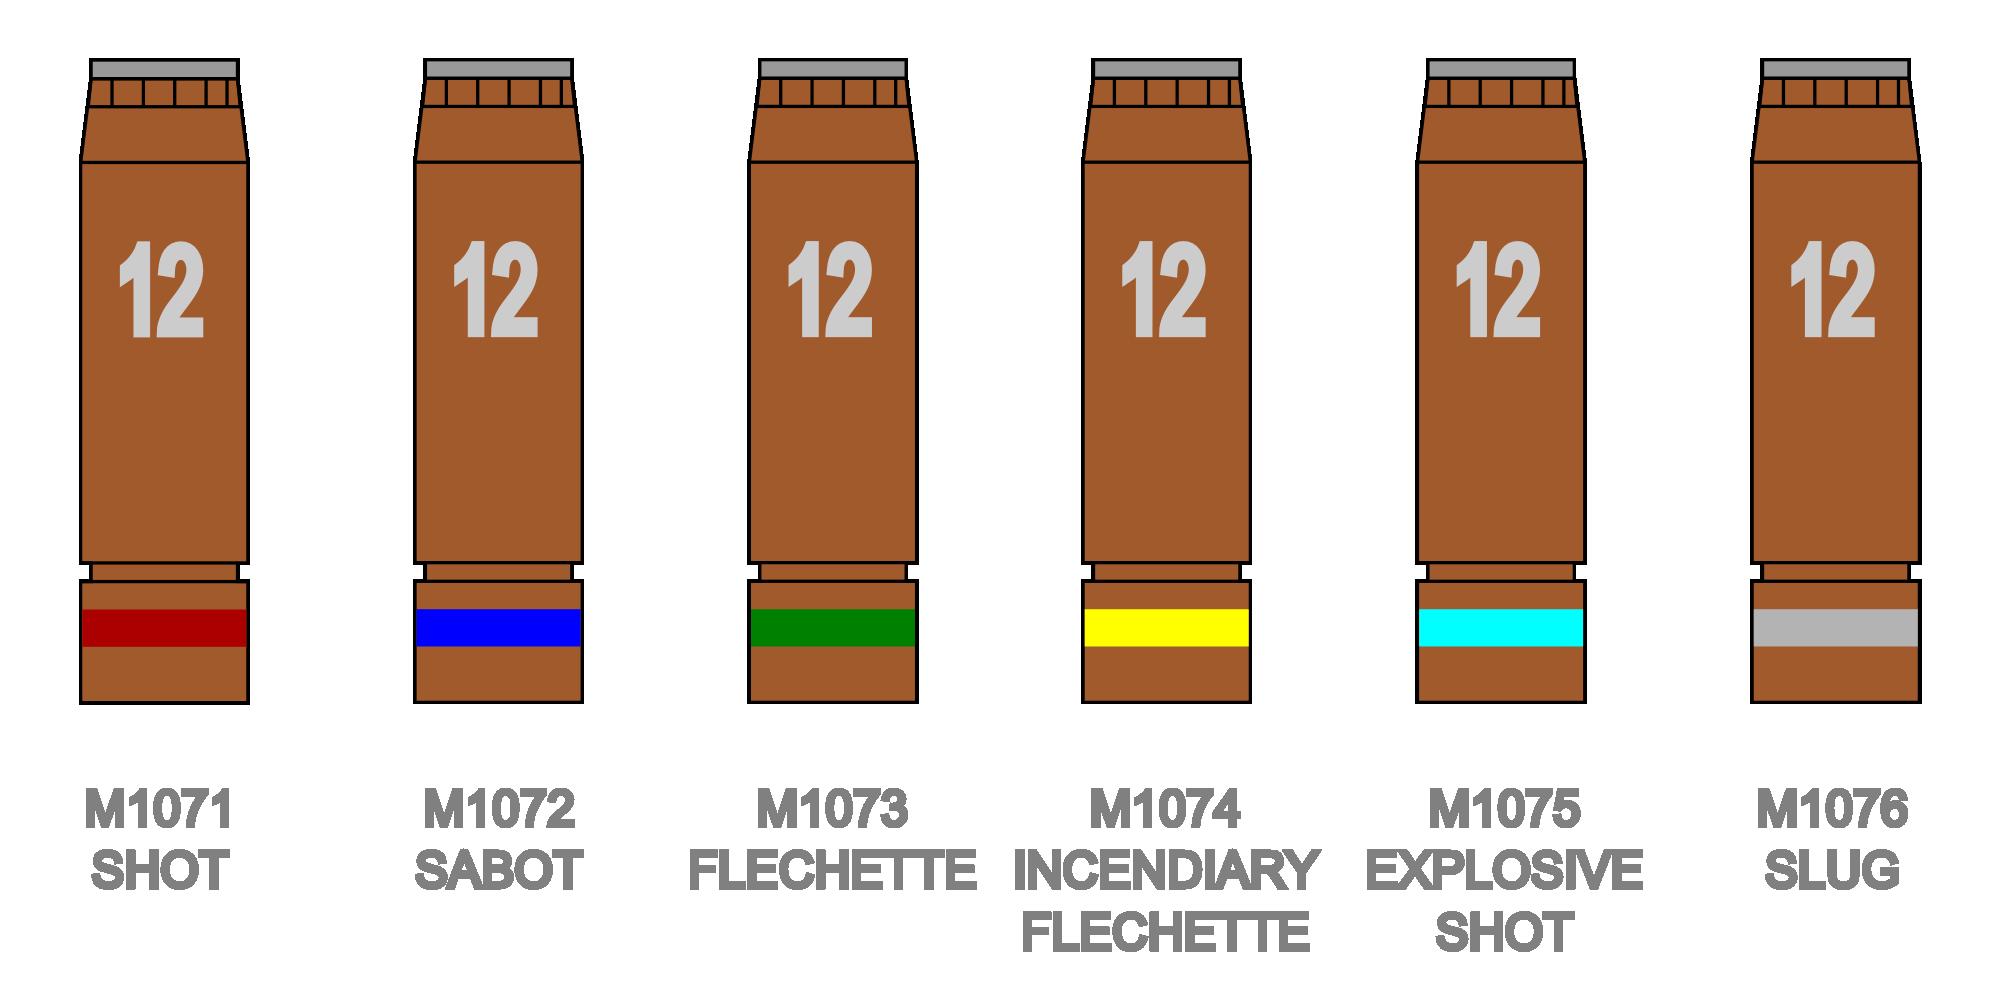 M11 shotgun | Halo Fanon | FANDOM powered by Wikia